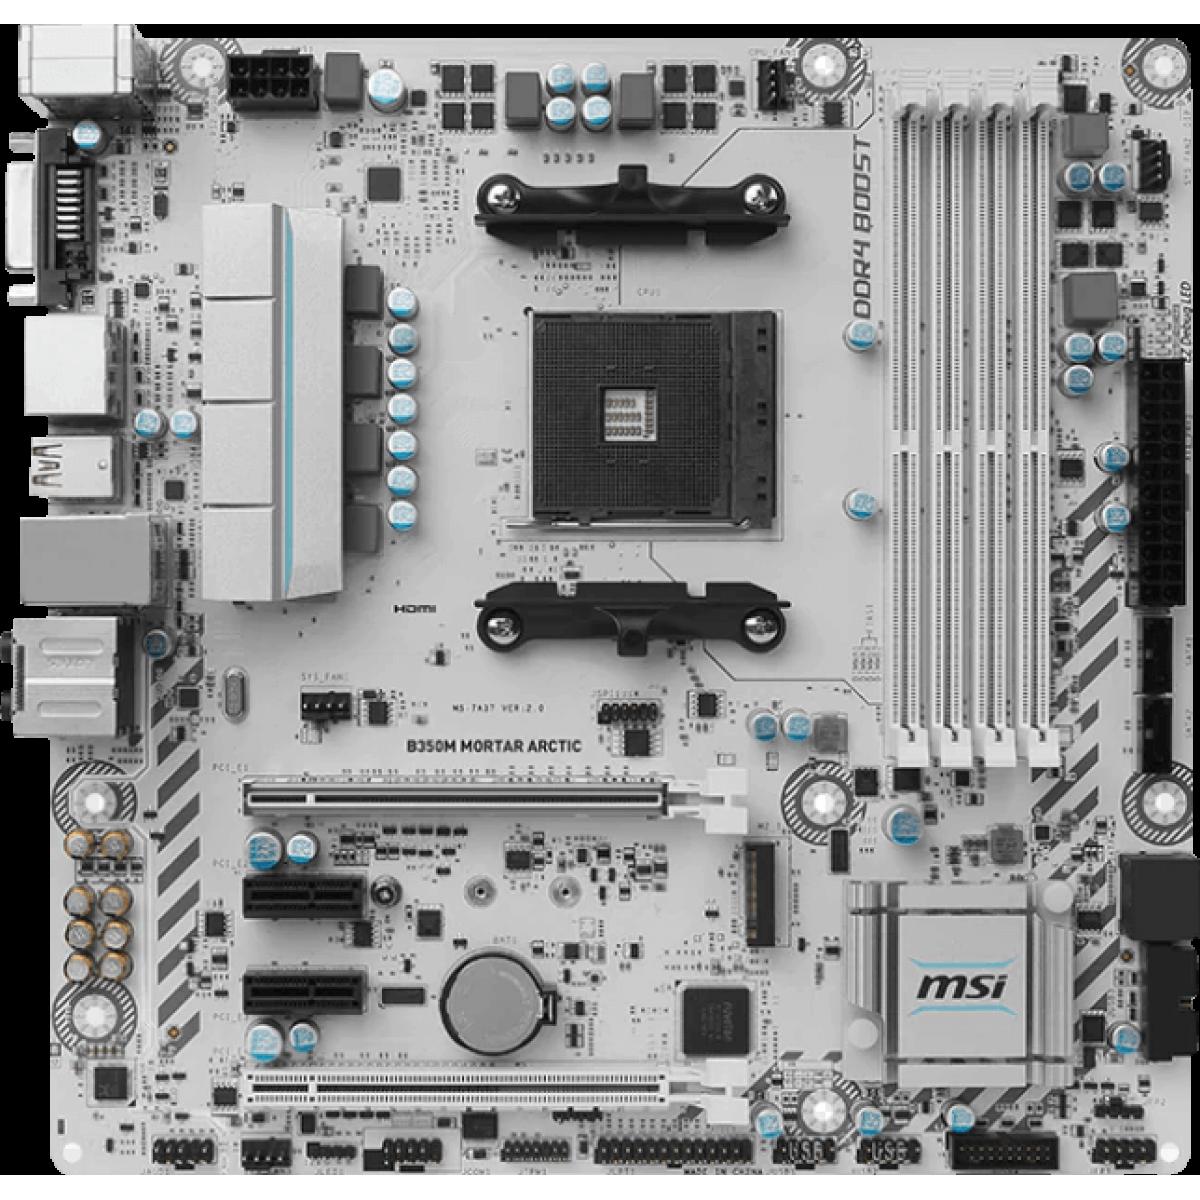 Placa Mãe MSI B350M Mortar Arctic, Chipset B350, AMD AM4, mATX, DDR4